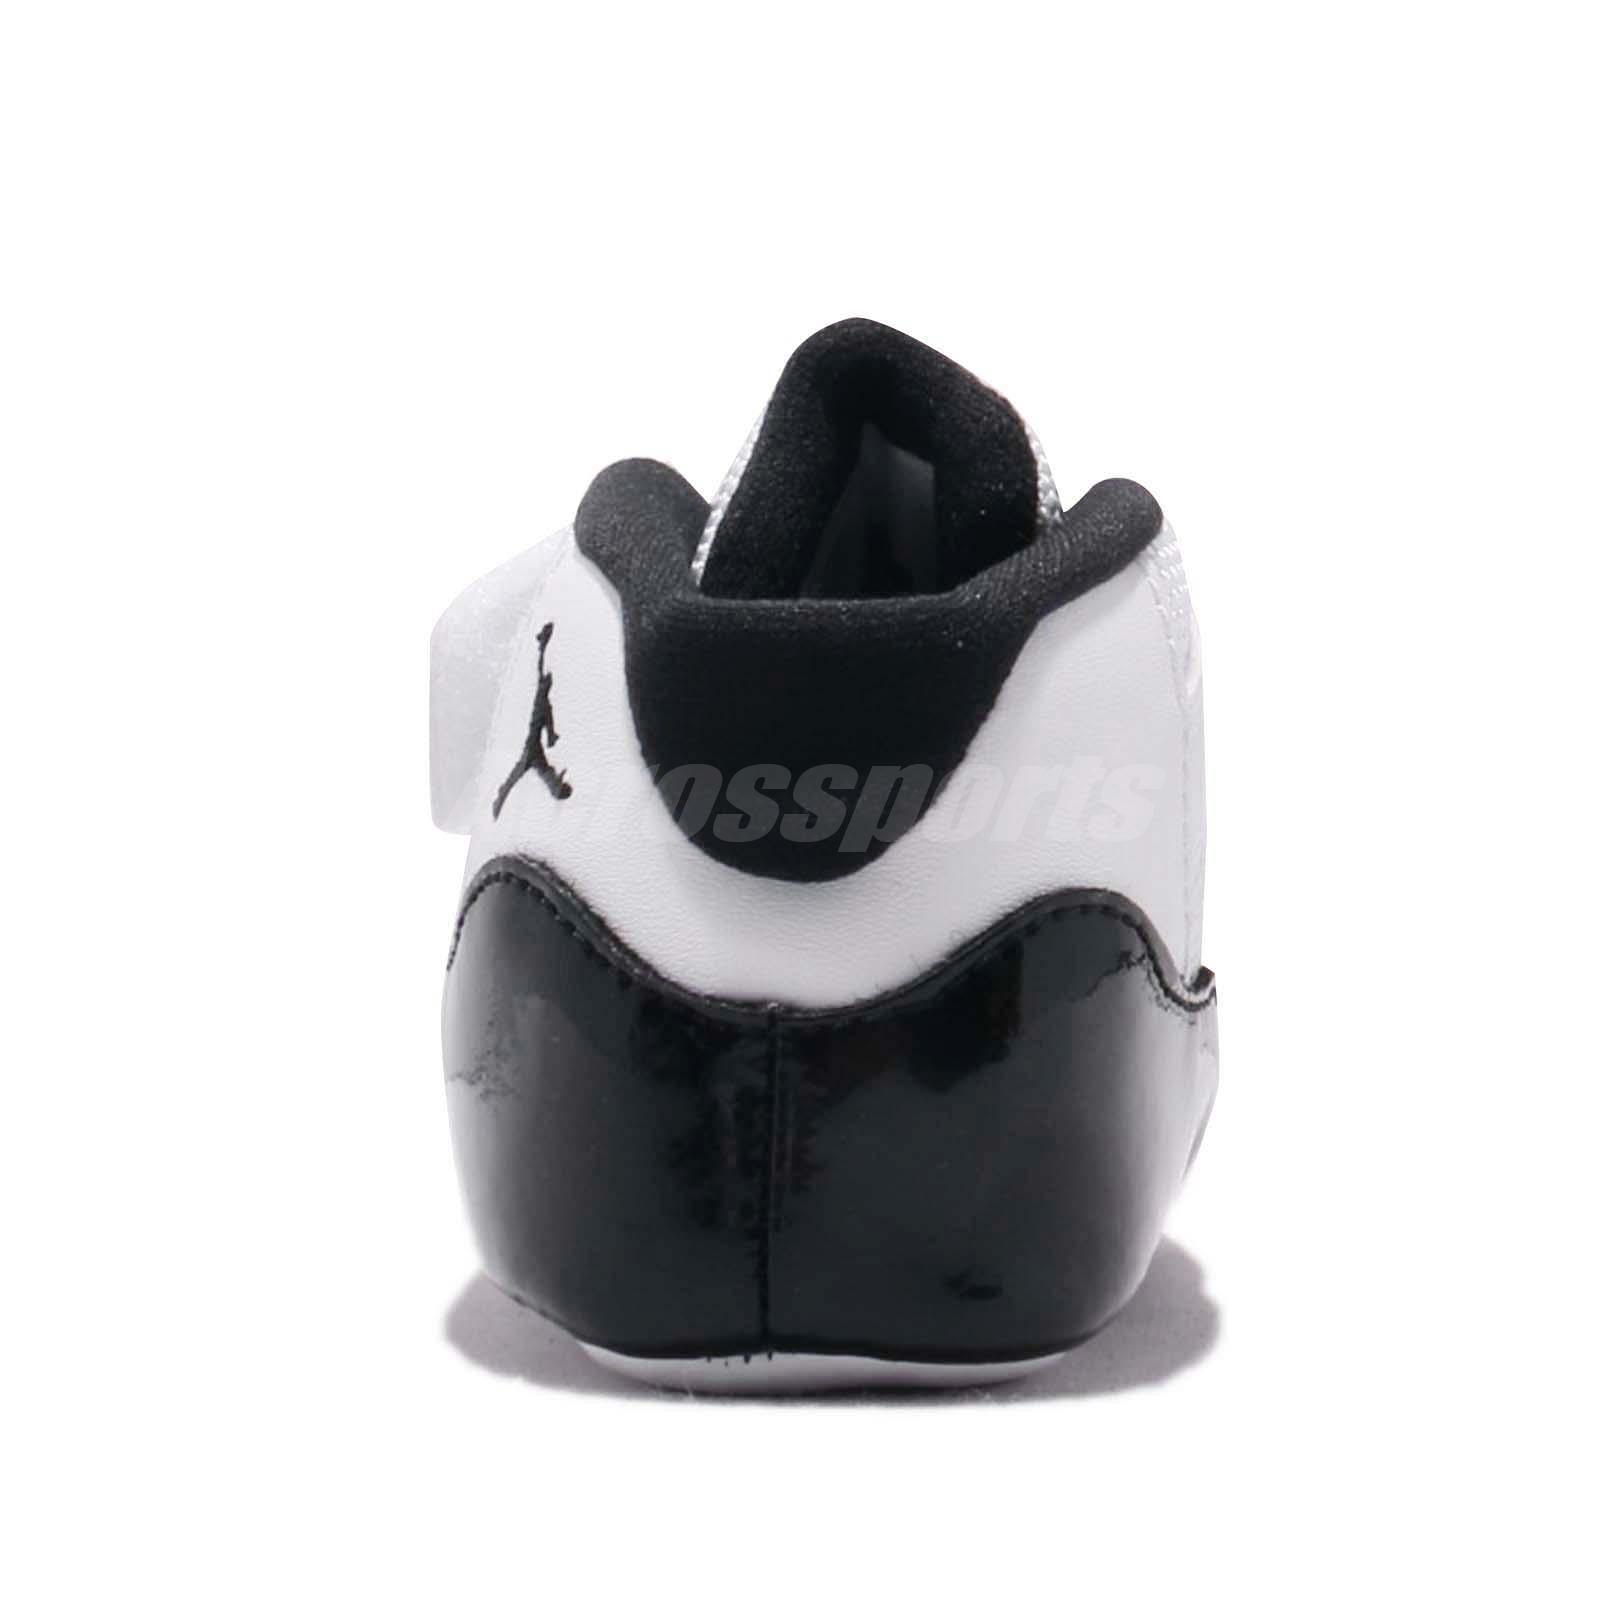 a2de5e9f4e3101 Nike Jordan 11 Retro Gift Pack GP XI AJ11 Concord TD Toddler Infant ...